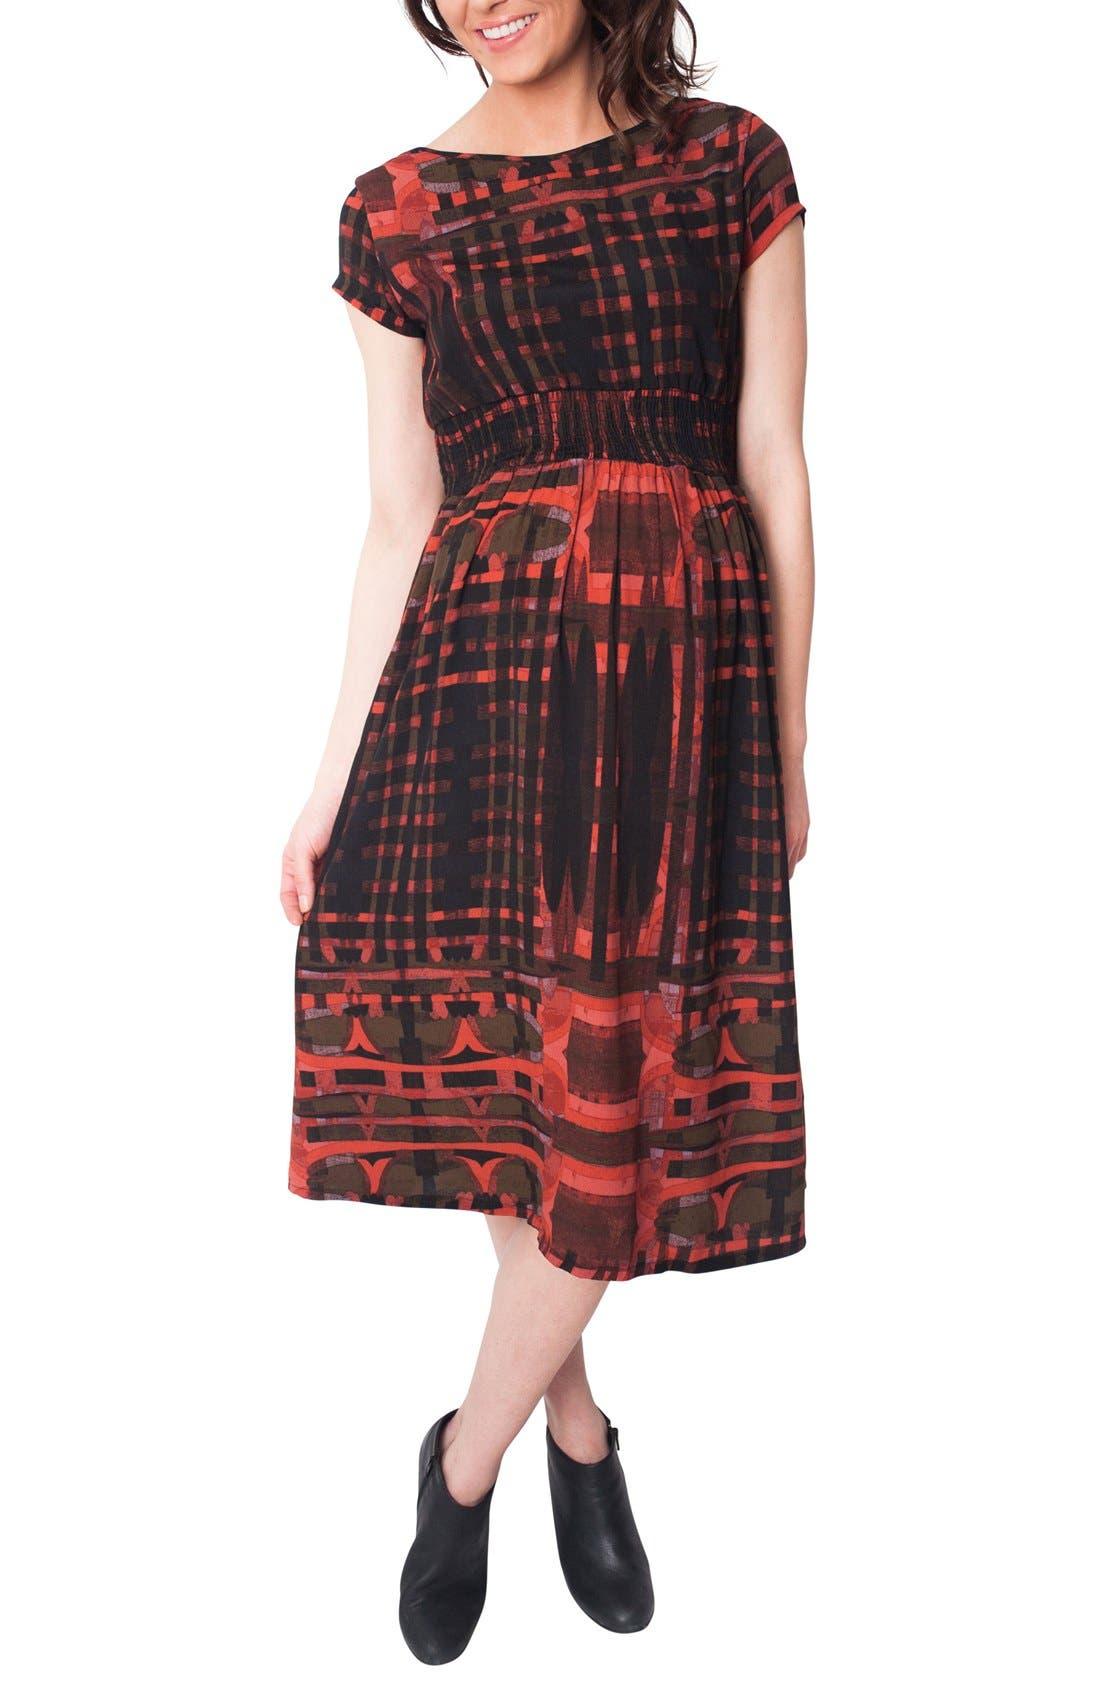 NOM MATERNITY Nom 'Max' Print Midi Maternity Dress